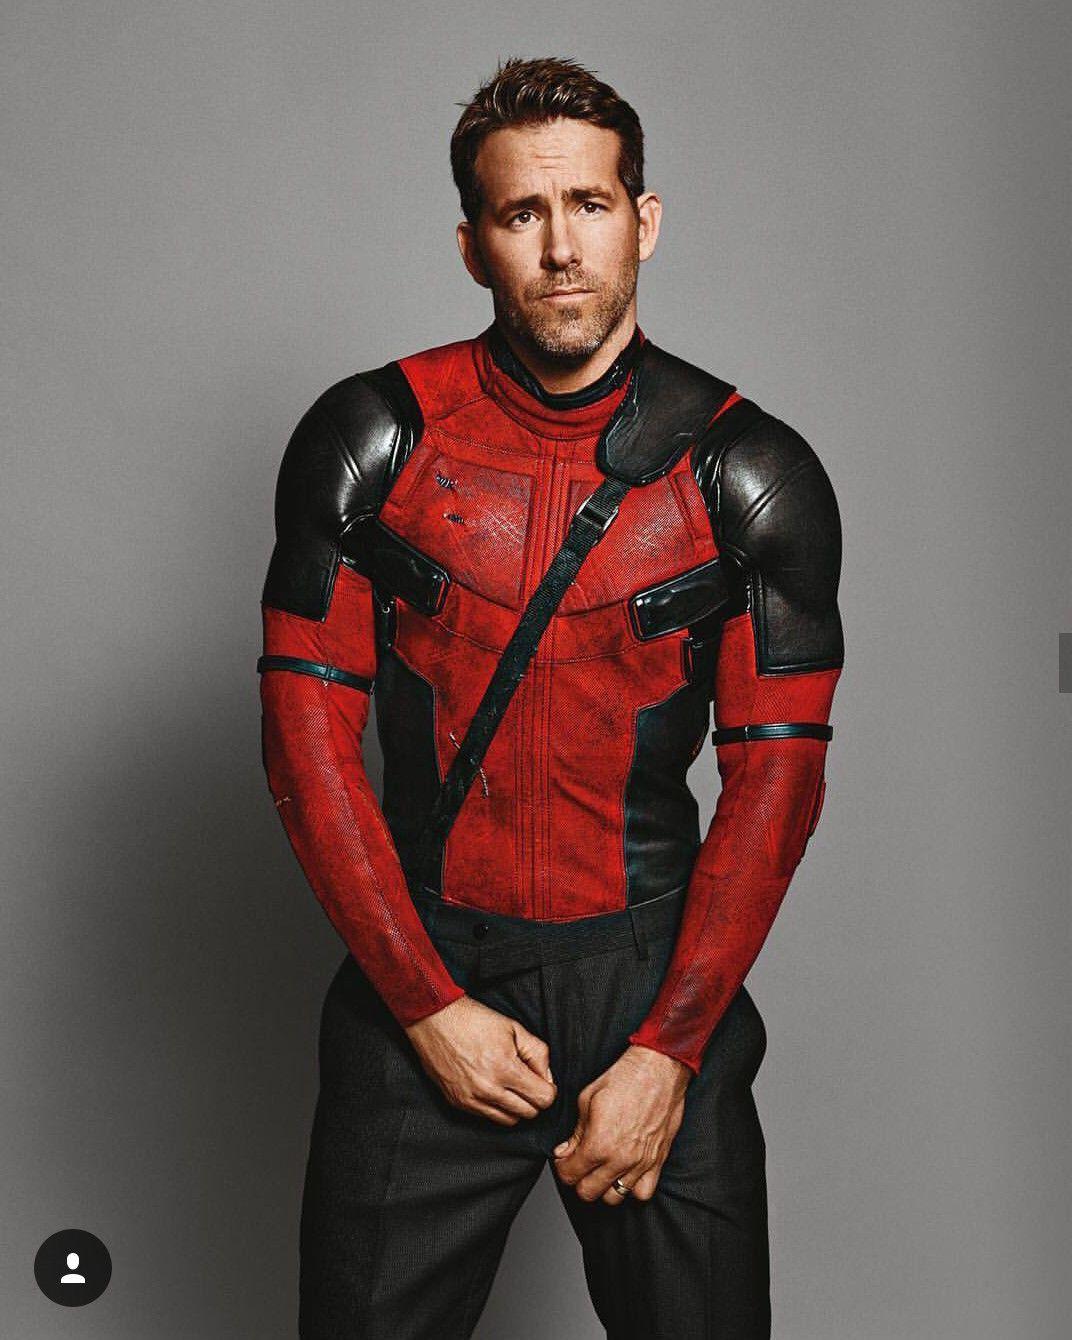 Ryan Reynolds / Deadpool Ryan reynolds deadpool, Ryan